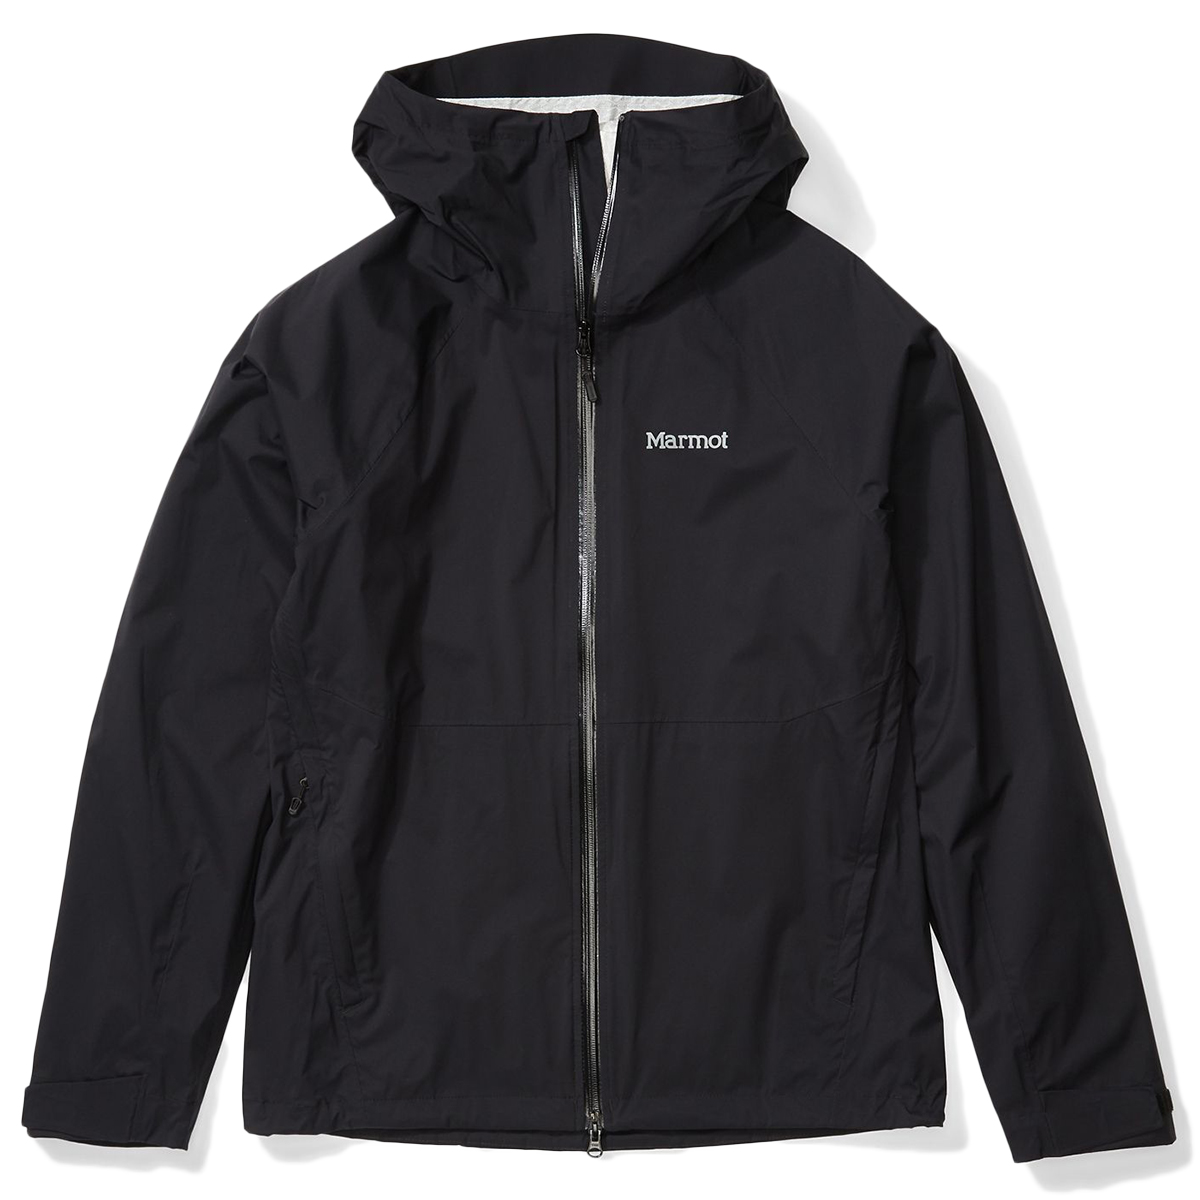 Marmot Men's Precip Stretch Jacket - Black, S